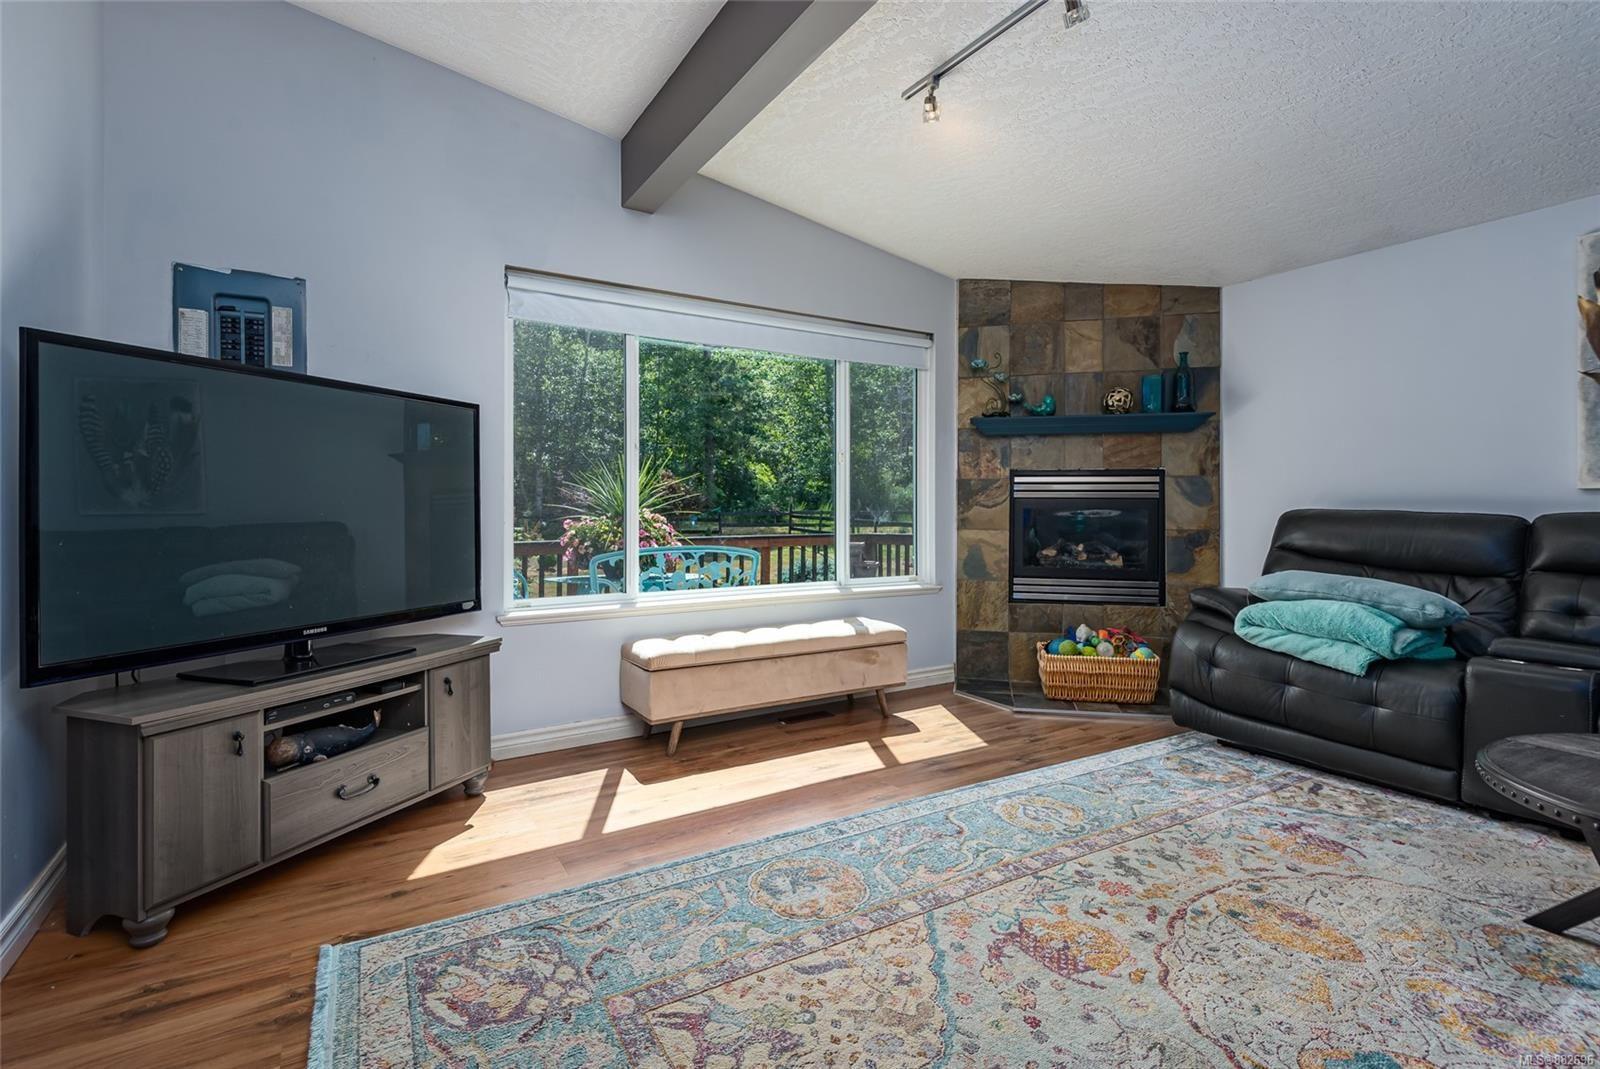 Photo 6: Photos: 3554 MacAulay Rd in : CV Merville Black Creek House for sale (Comox Valley)  : MLS®# 882696